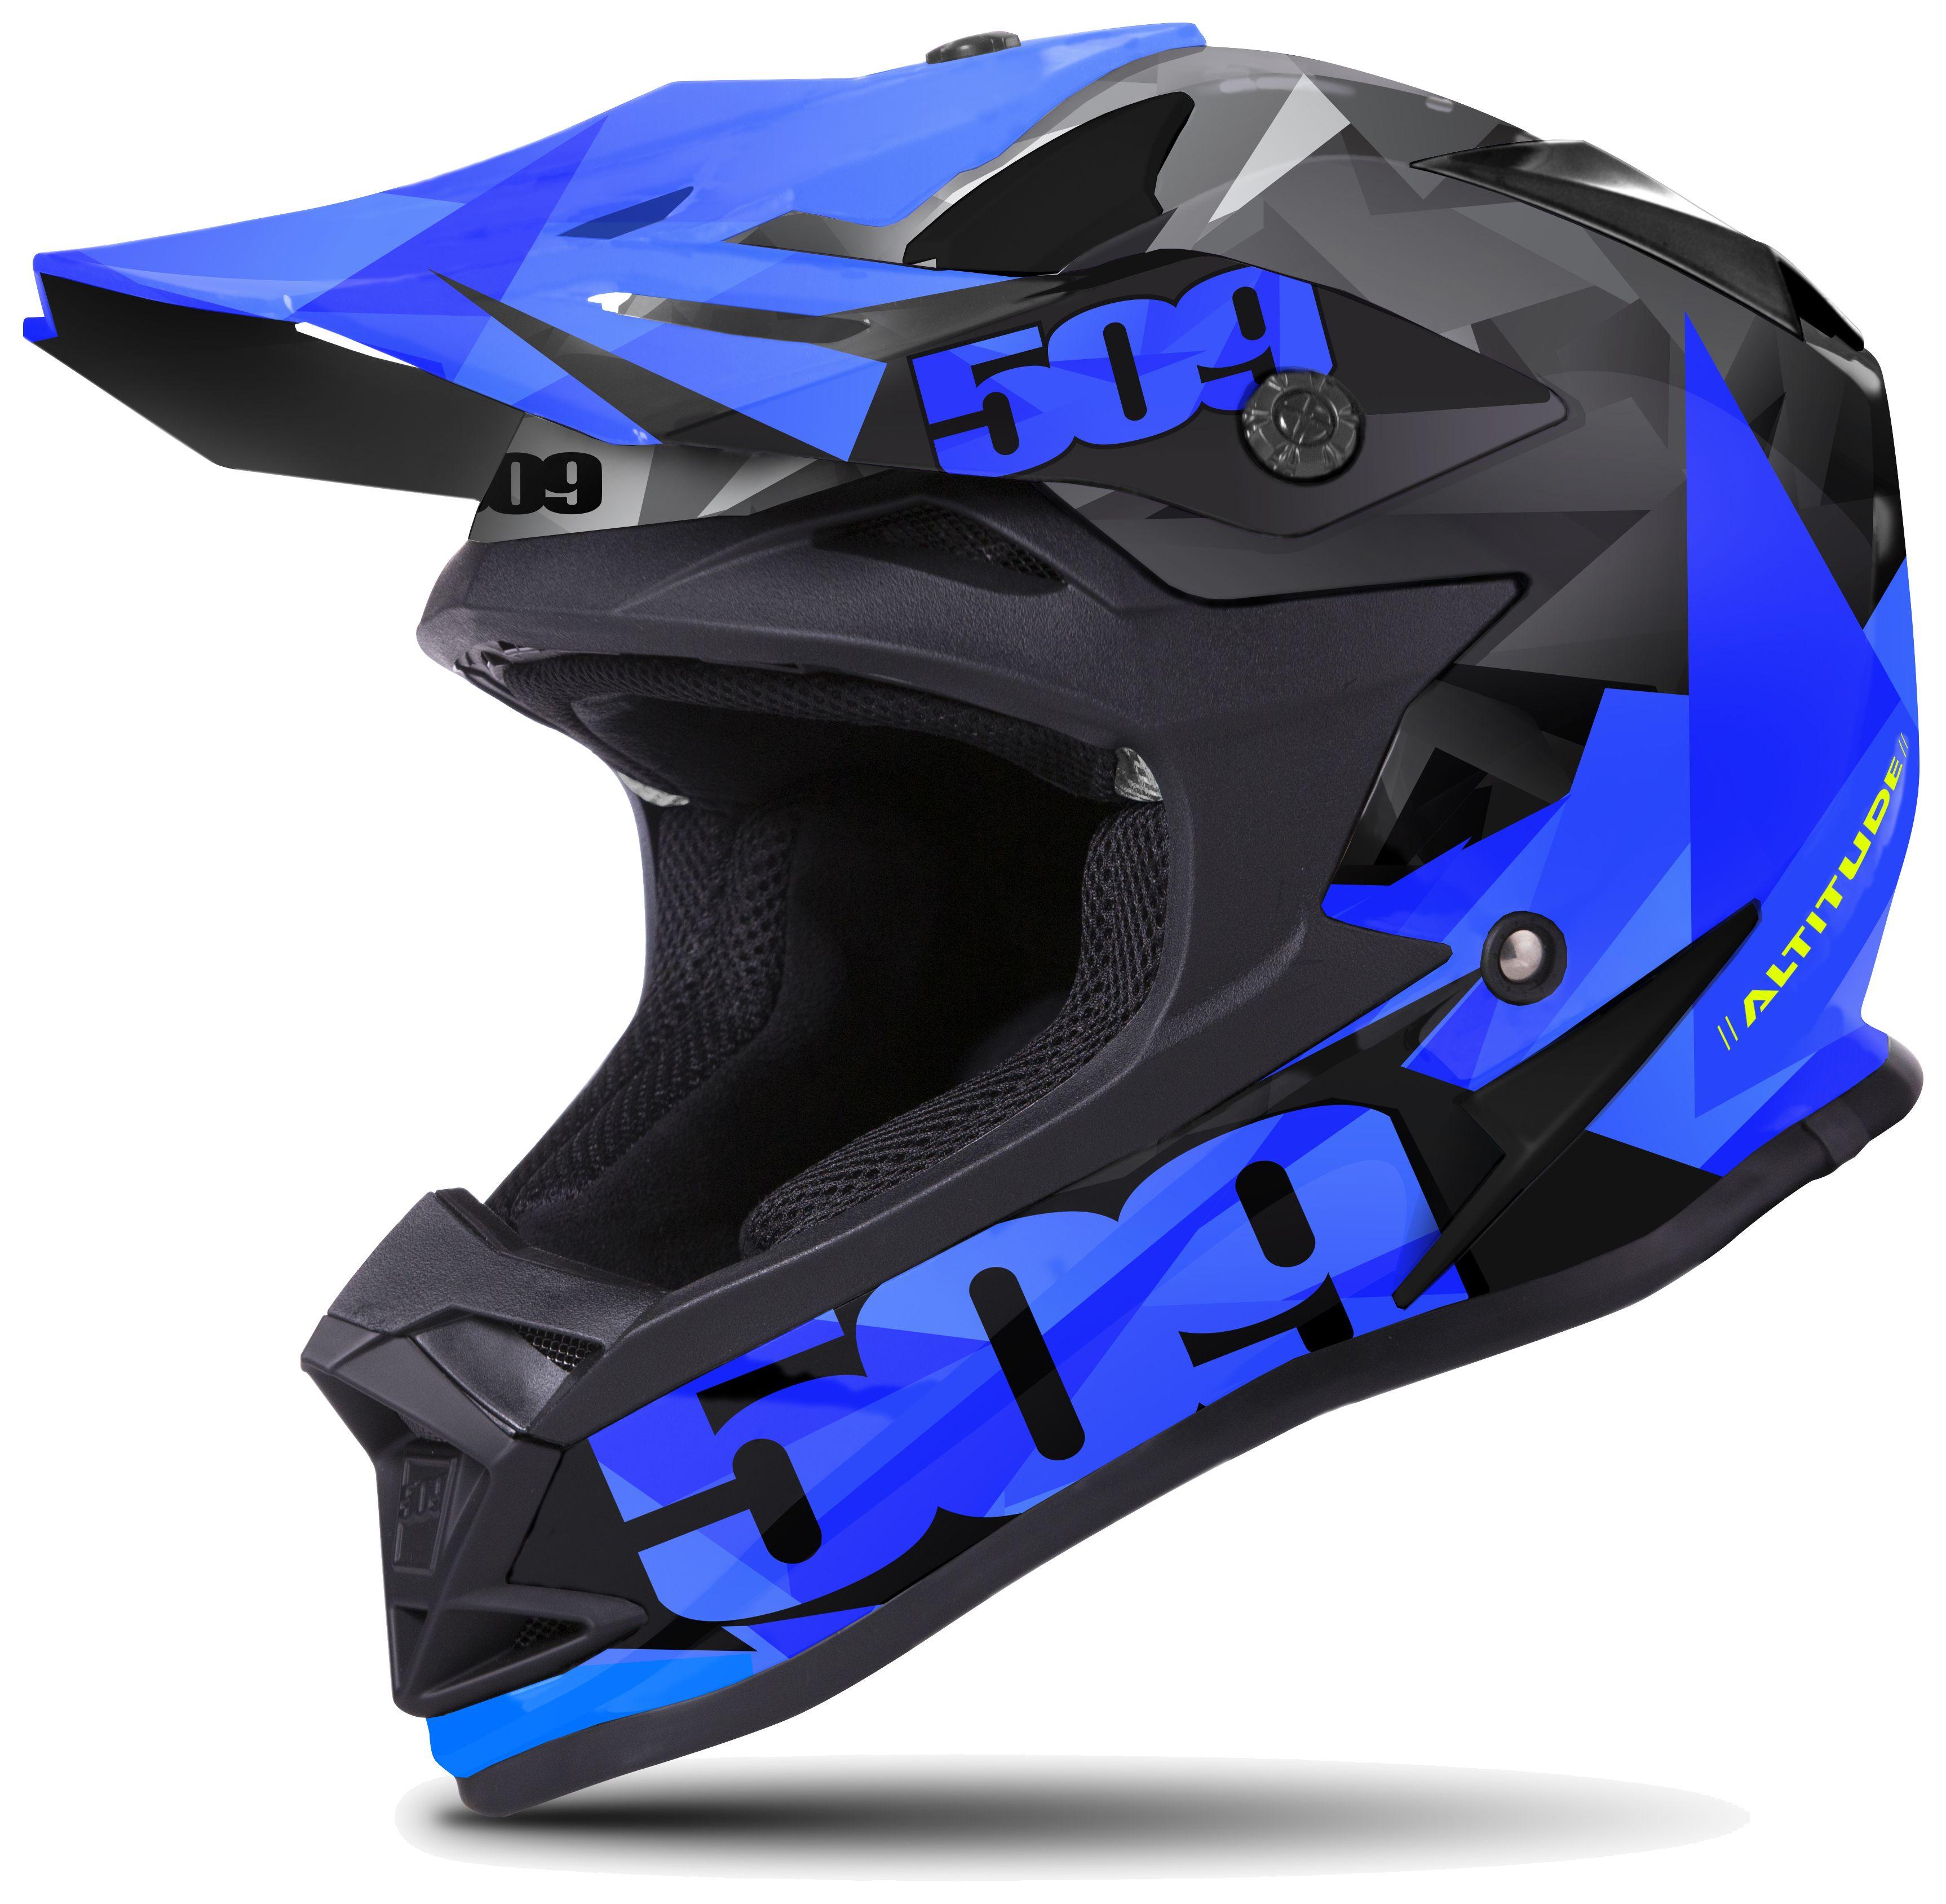 509 Altitude Triangle Helmet 30 71 98 Off Revzilla